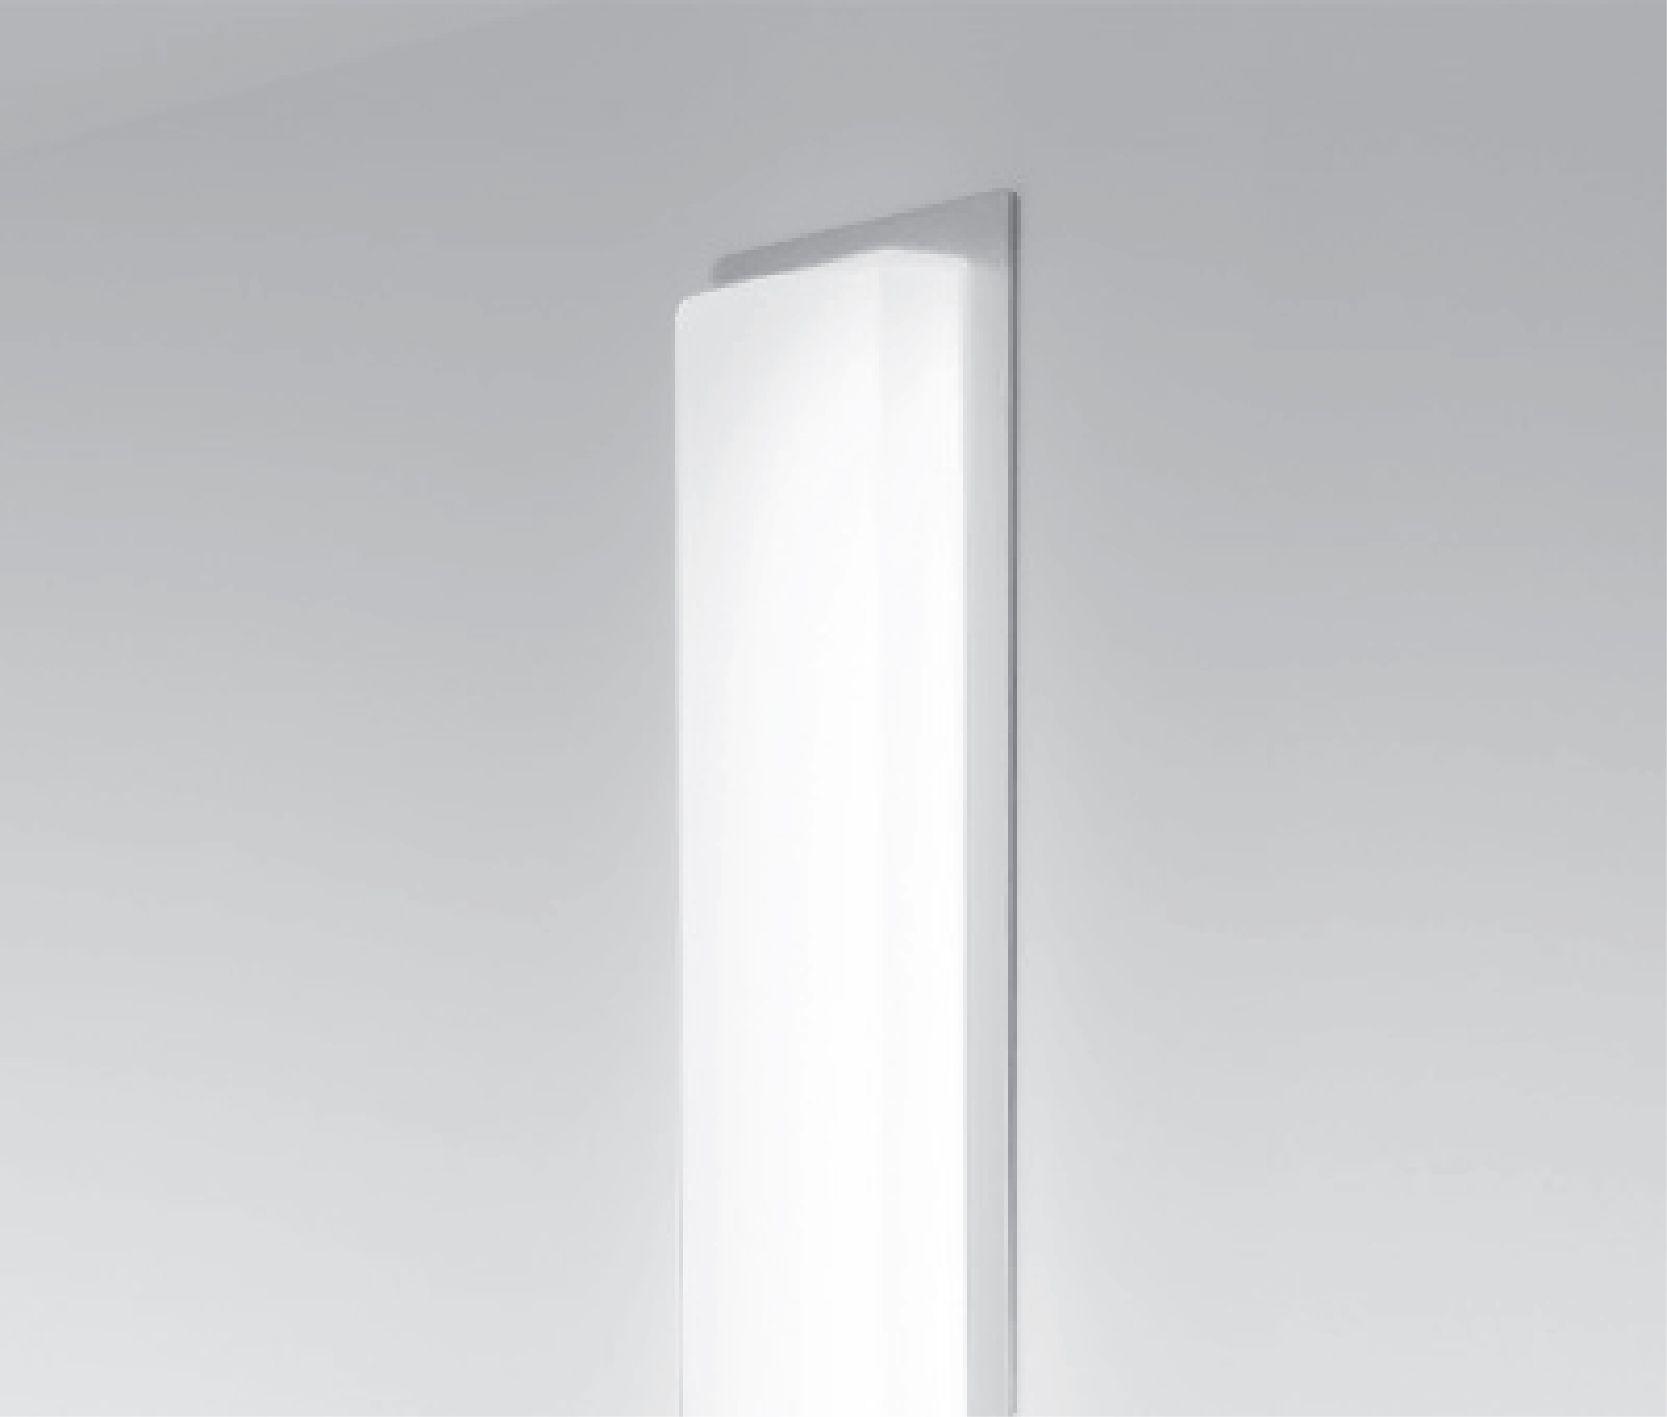 Birchwood Lighting Jill Led Recessed Linear Ceiling Light Fixture